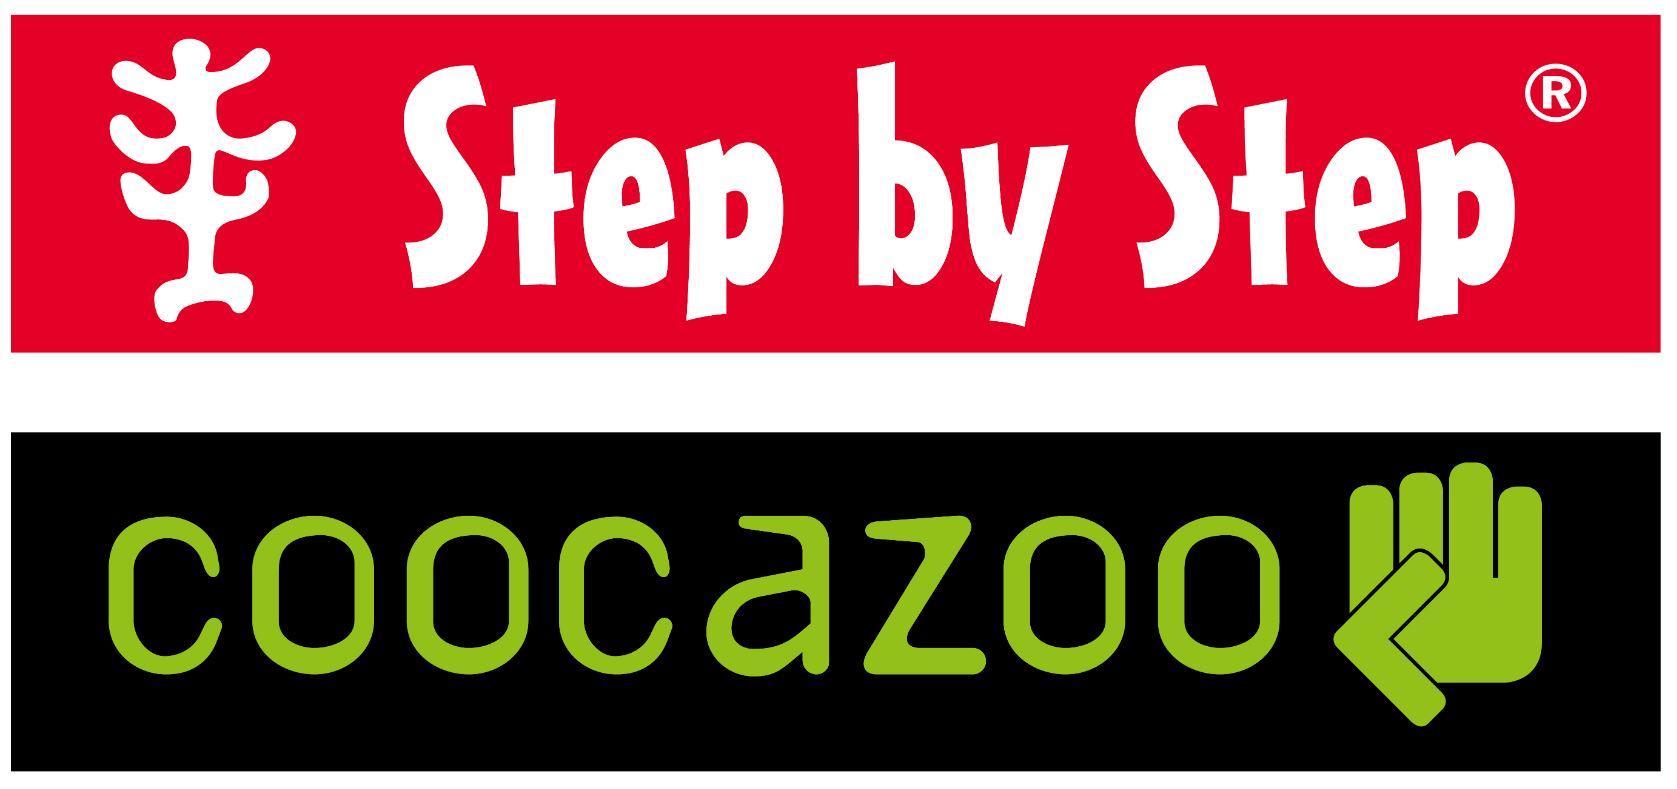 Step by Step & coocazoo